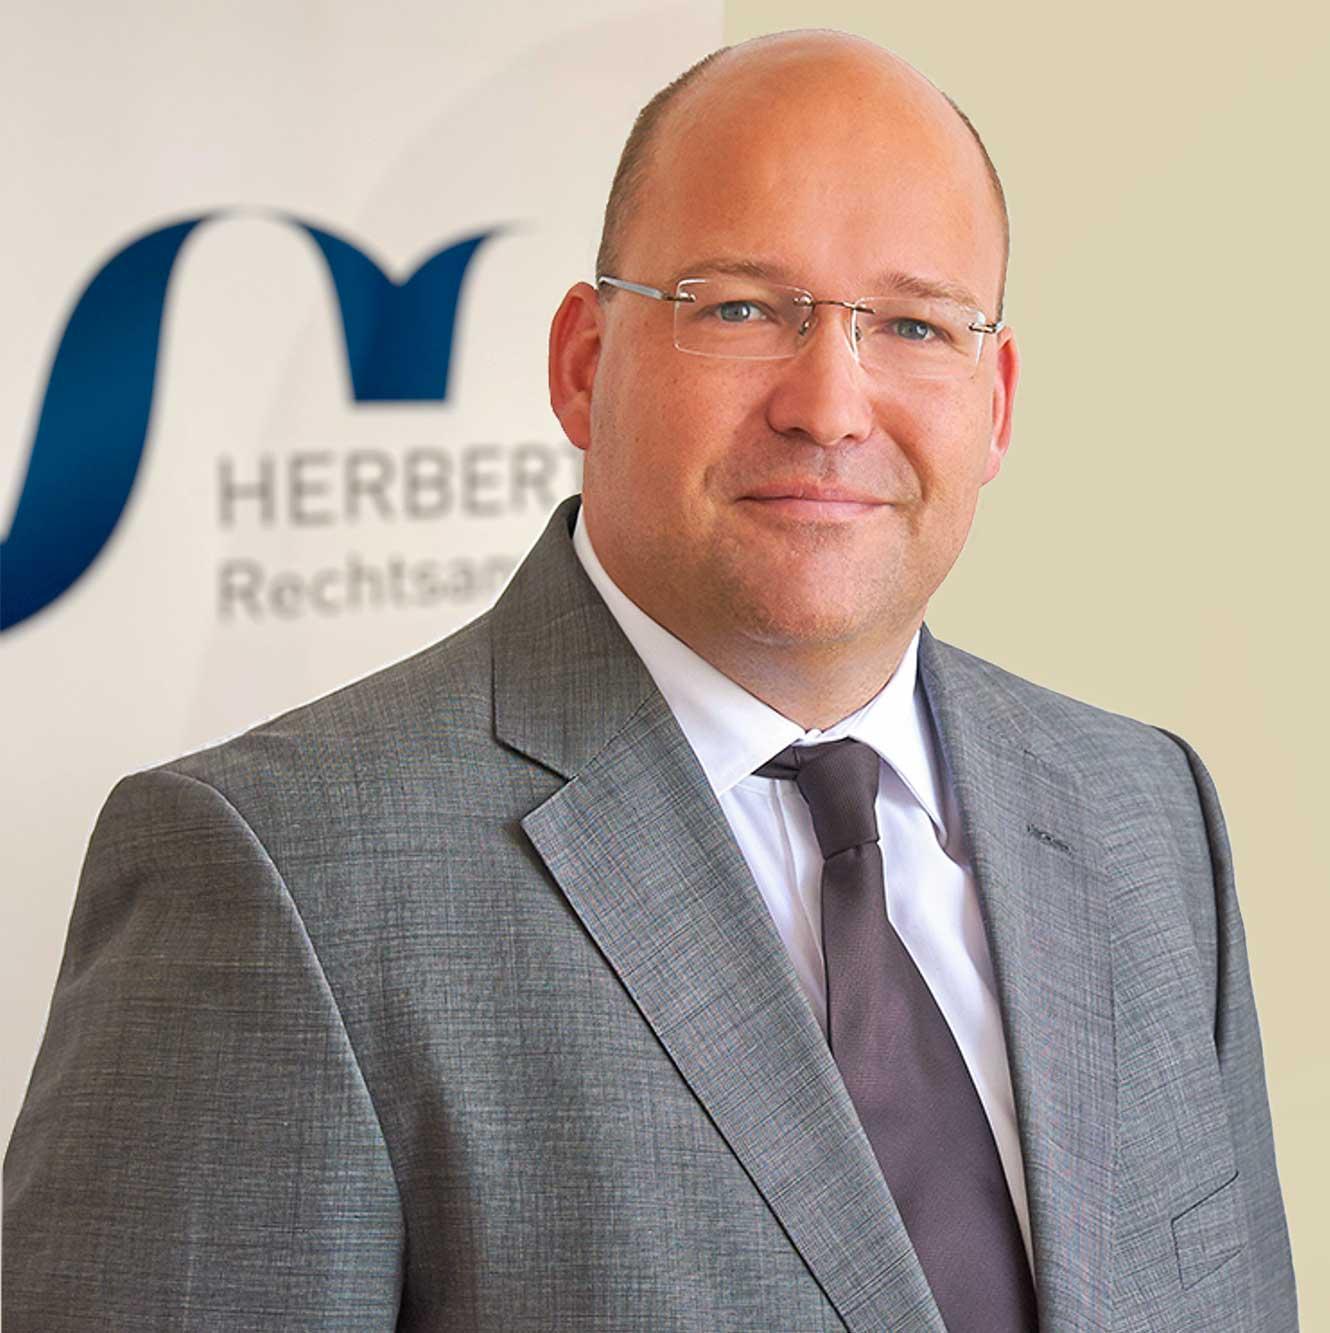 Stefan-Marc Rehm - Fachanwalt für Strafrecht - Herbert Rechtsanwälte Saarbrücken